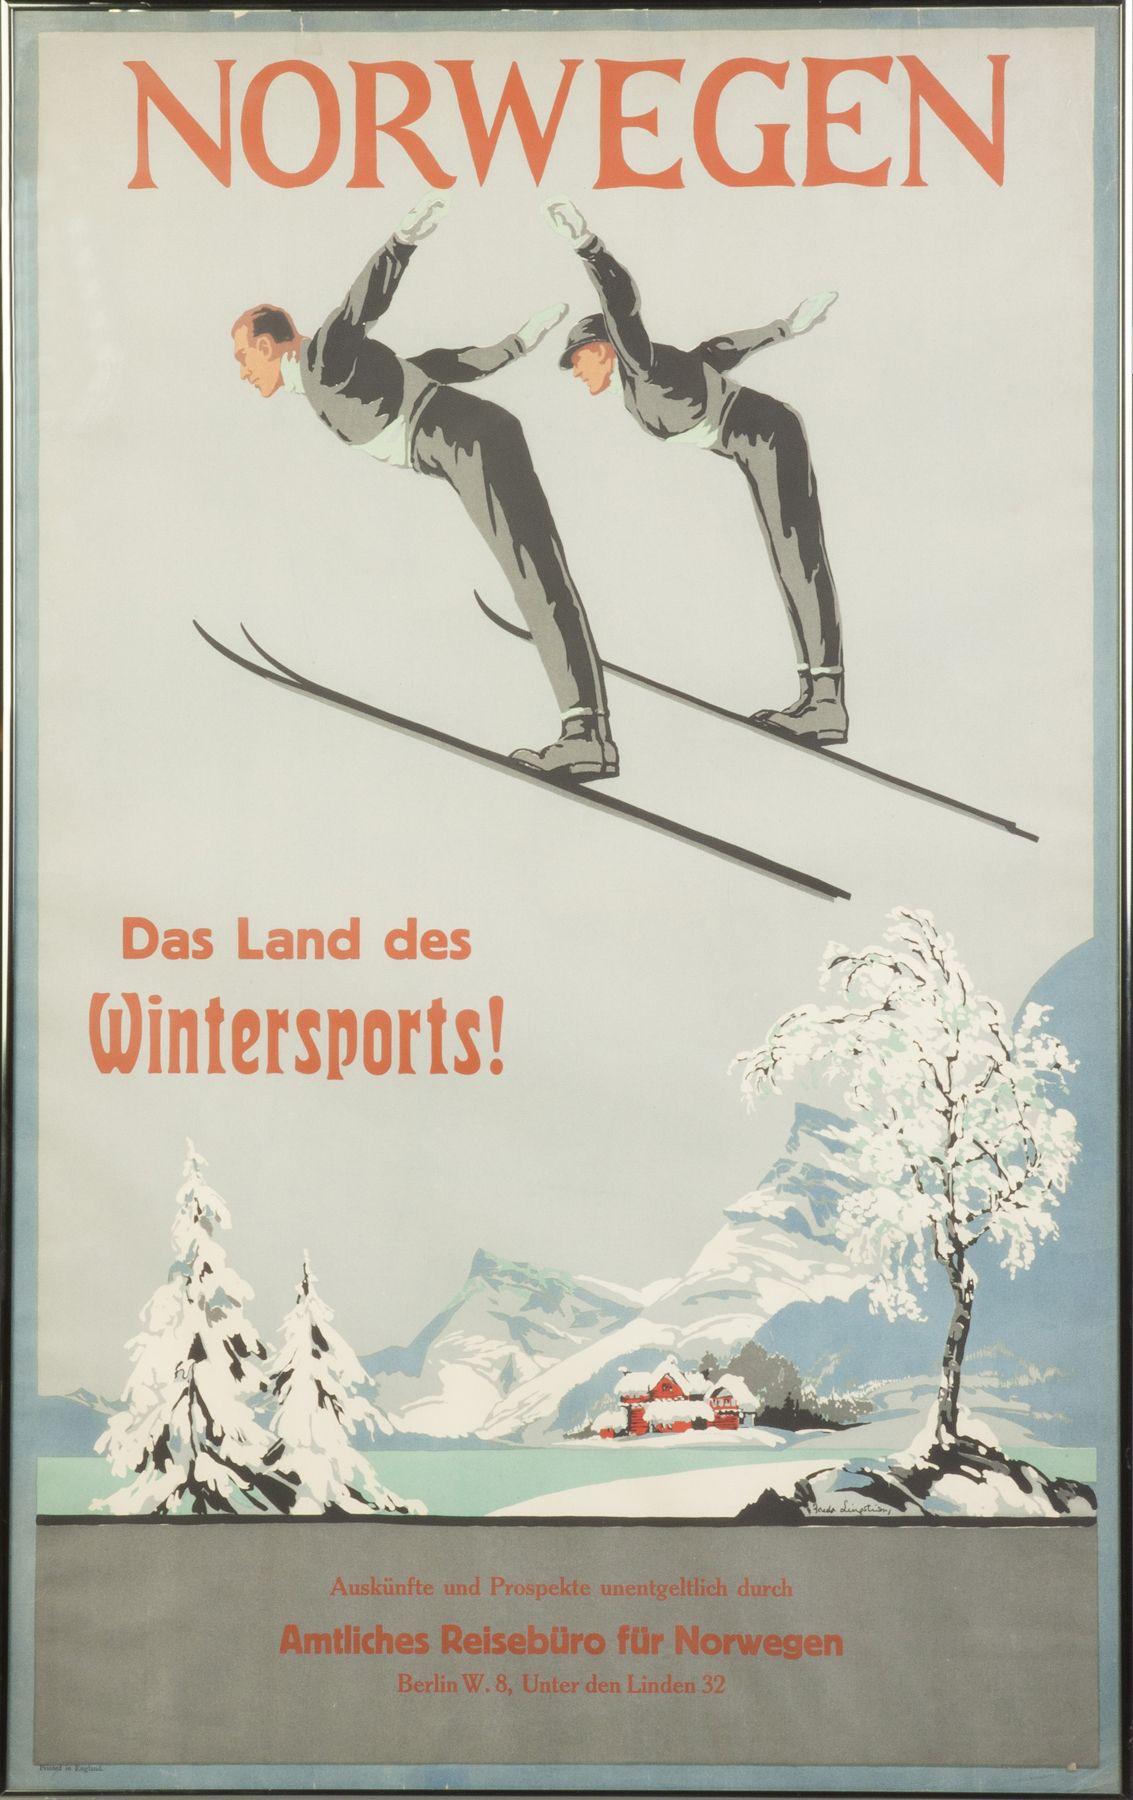 Norwegian Ski Poster By Freda Lingstrom Sold 3 200 Vintage Posters Noorwegen Poster